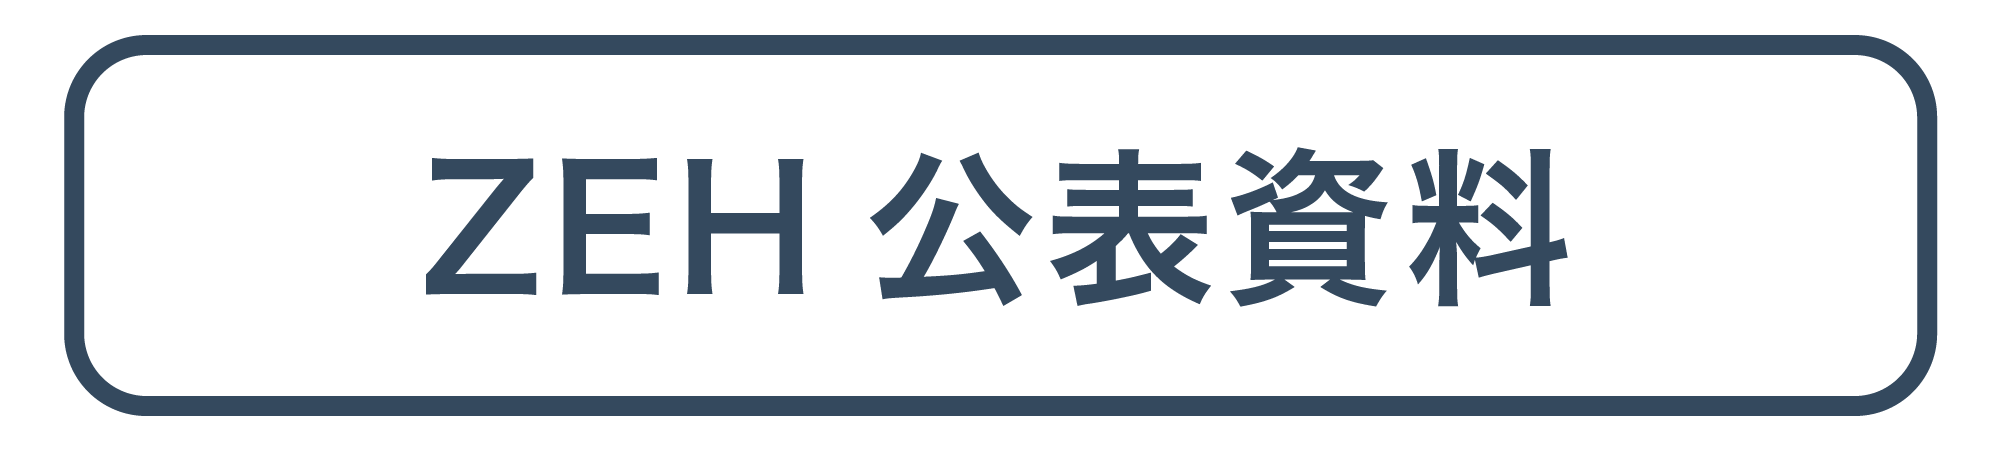 ZEH公表資料